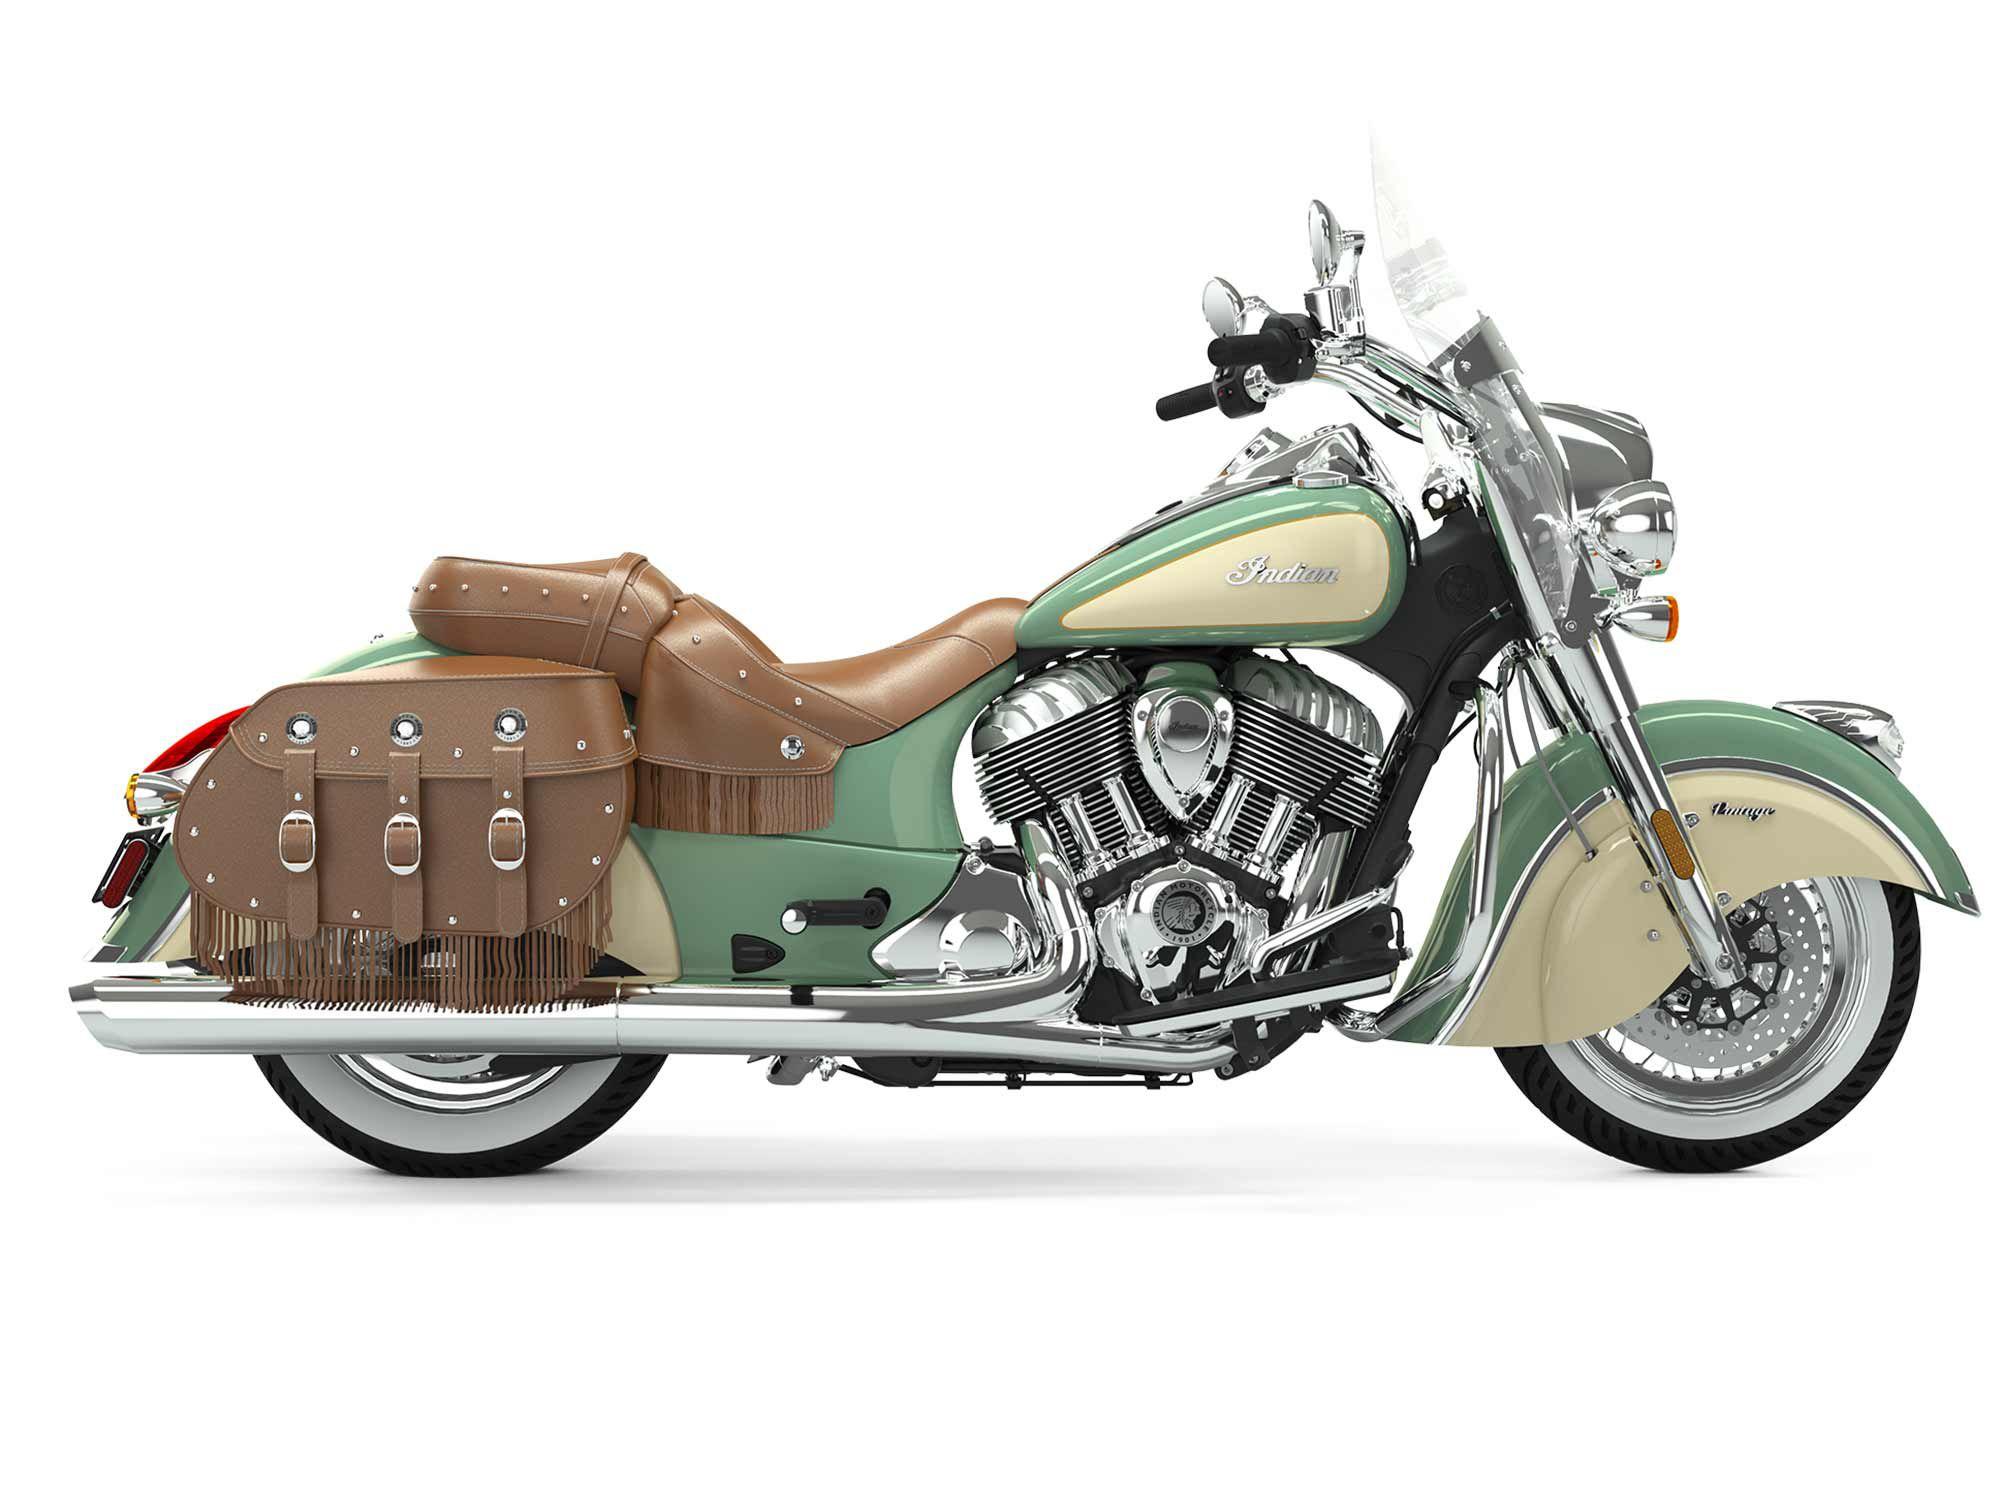 2020 Indian Chief Vintage